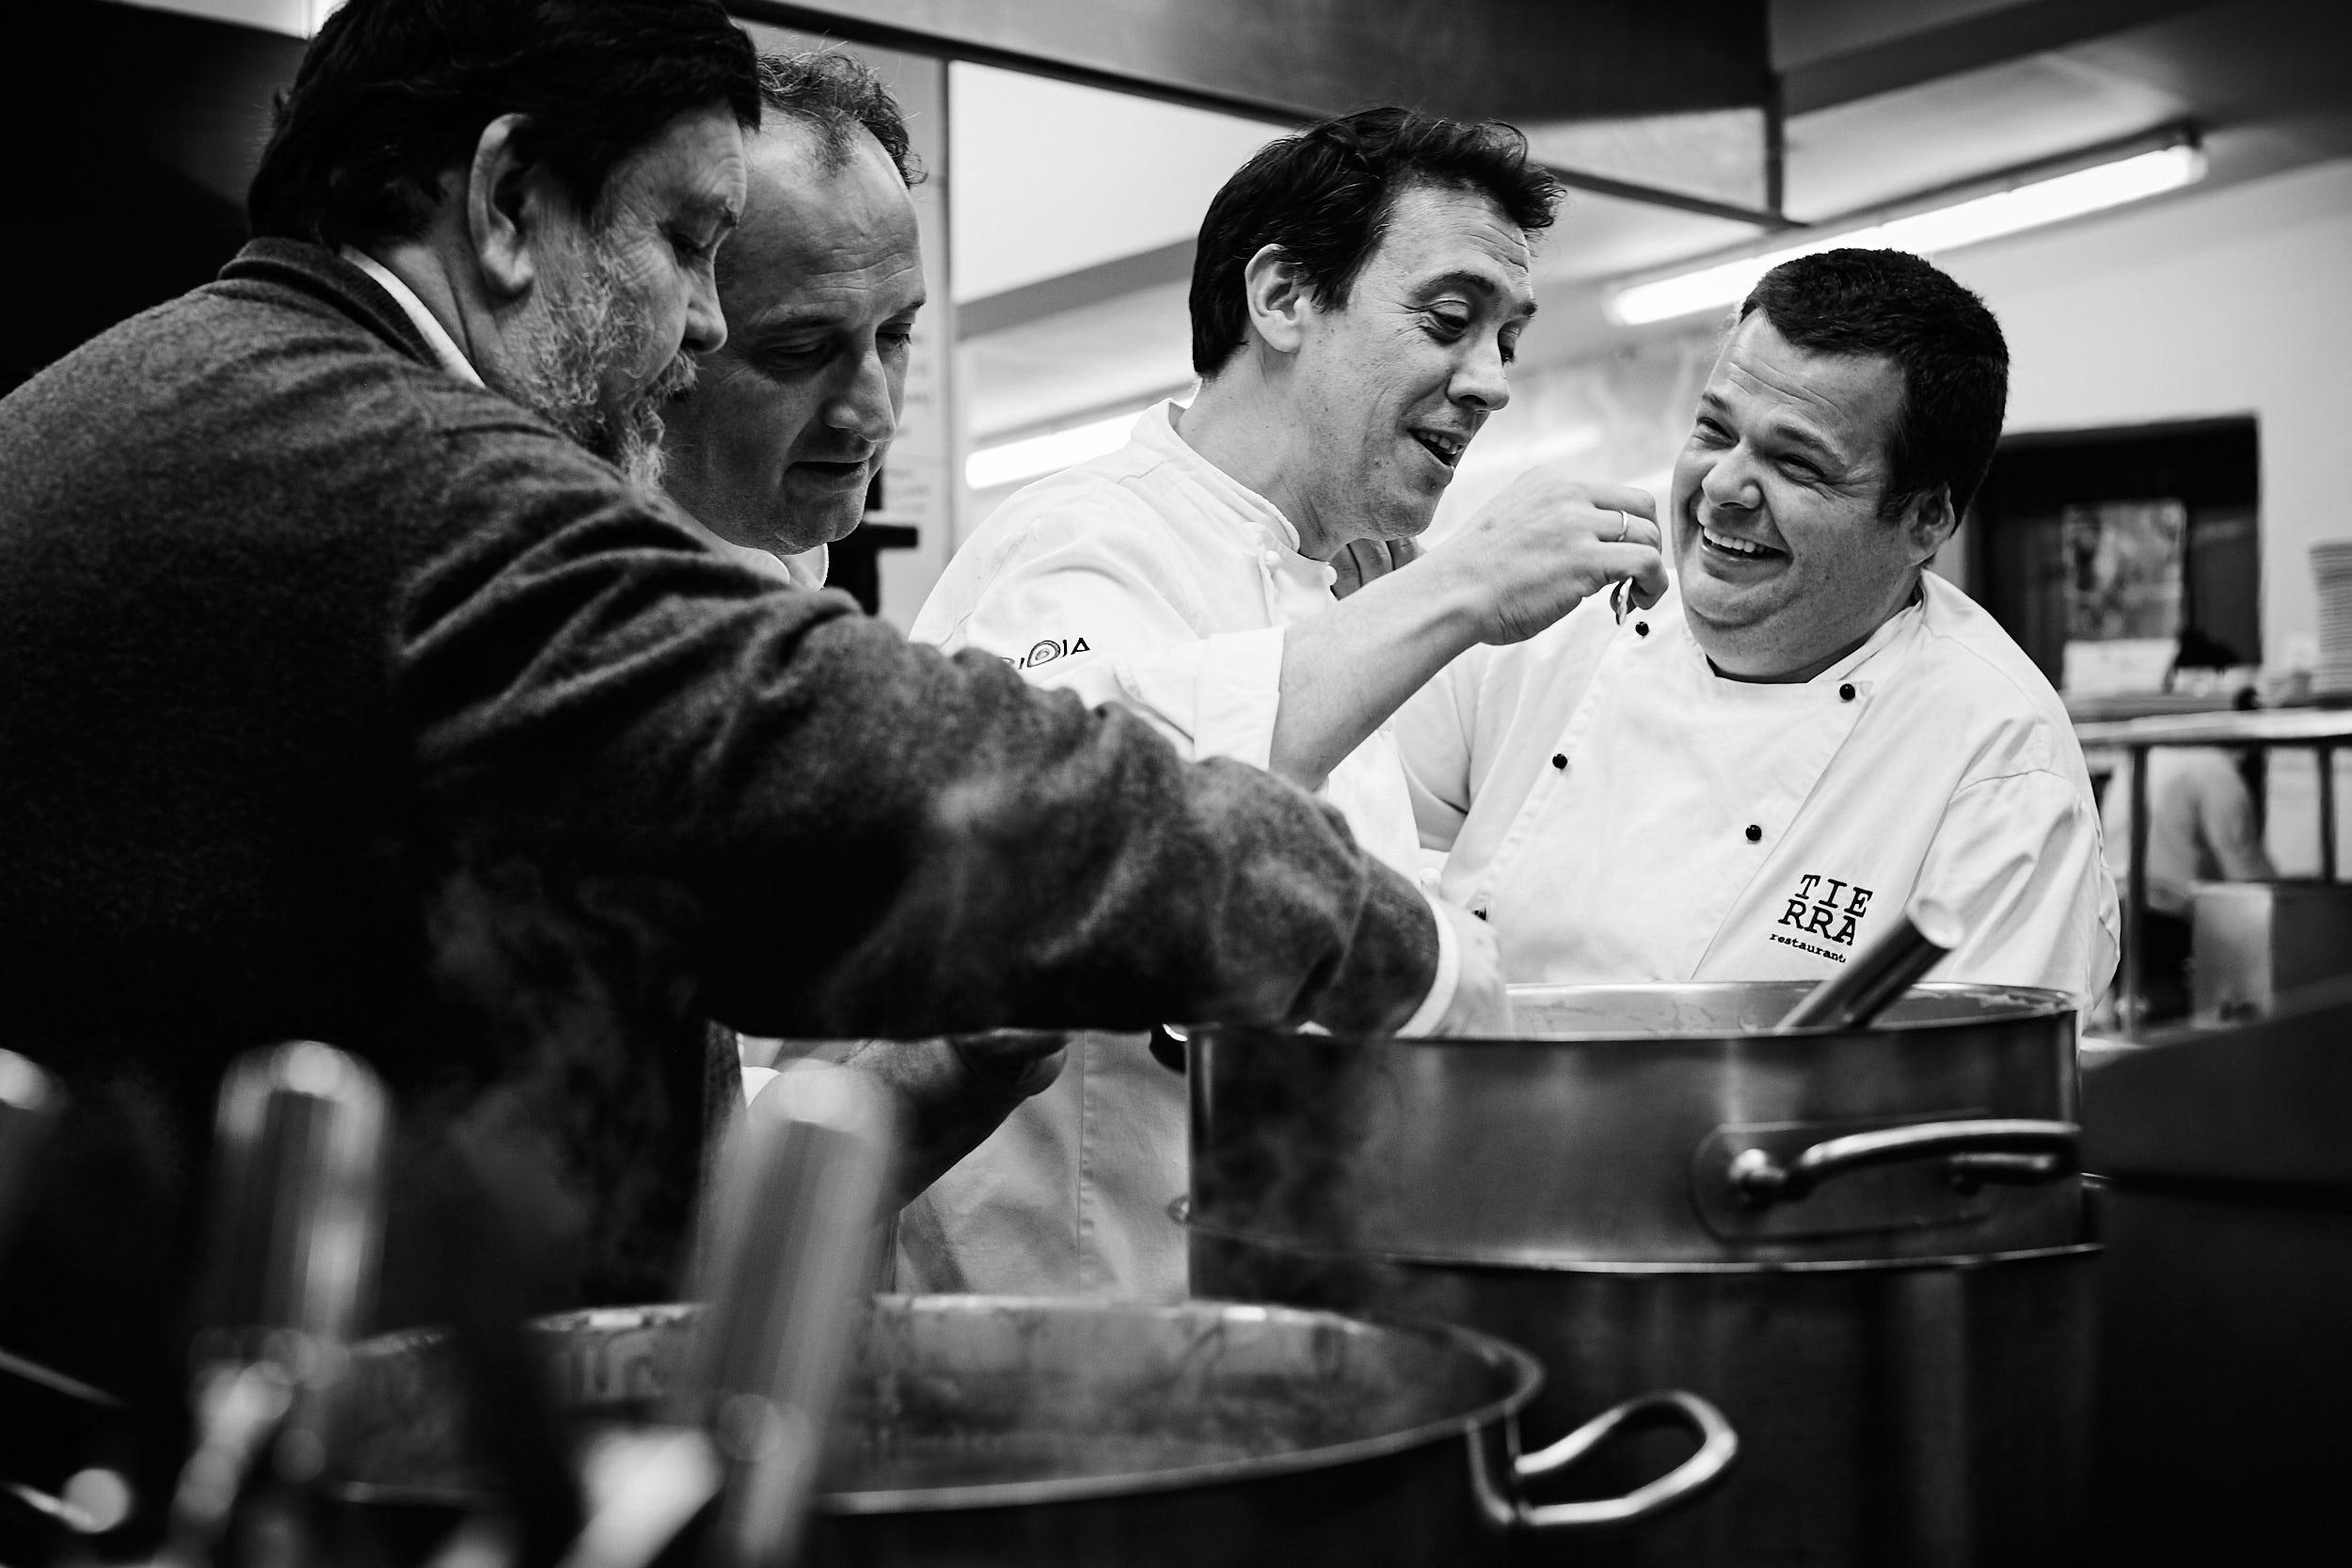 1903Restaurante_La_Vieja_Bodega_Casalarreina_La_Rioja_Spain_Sturcke_0003.jpg